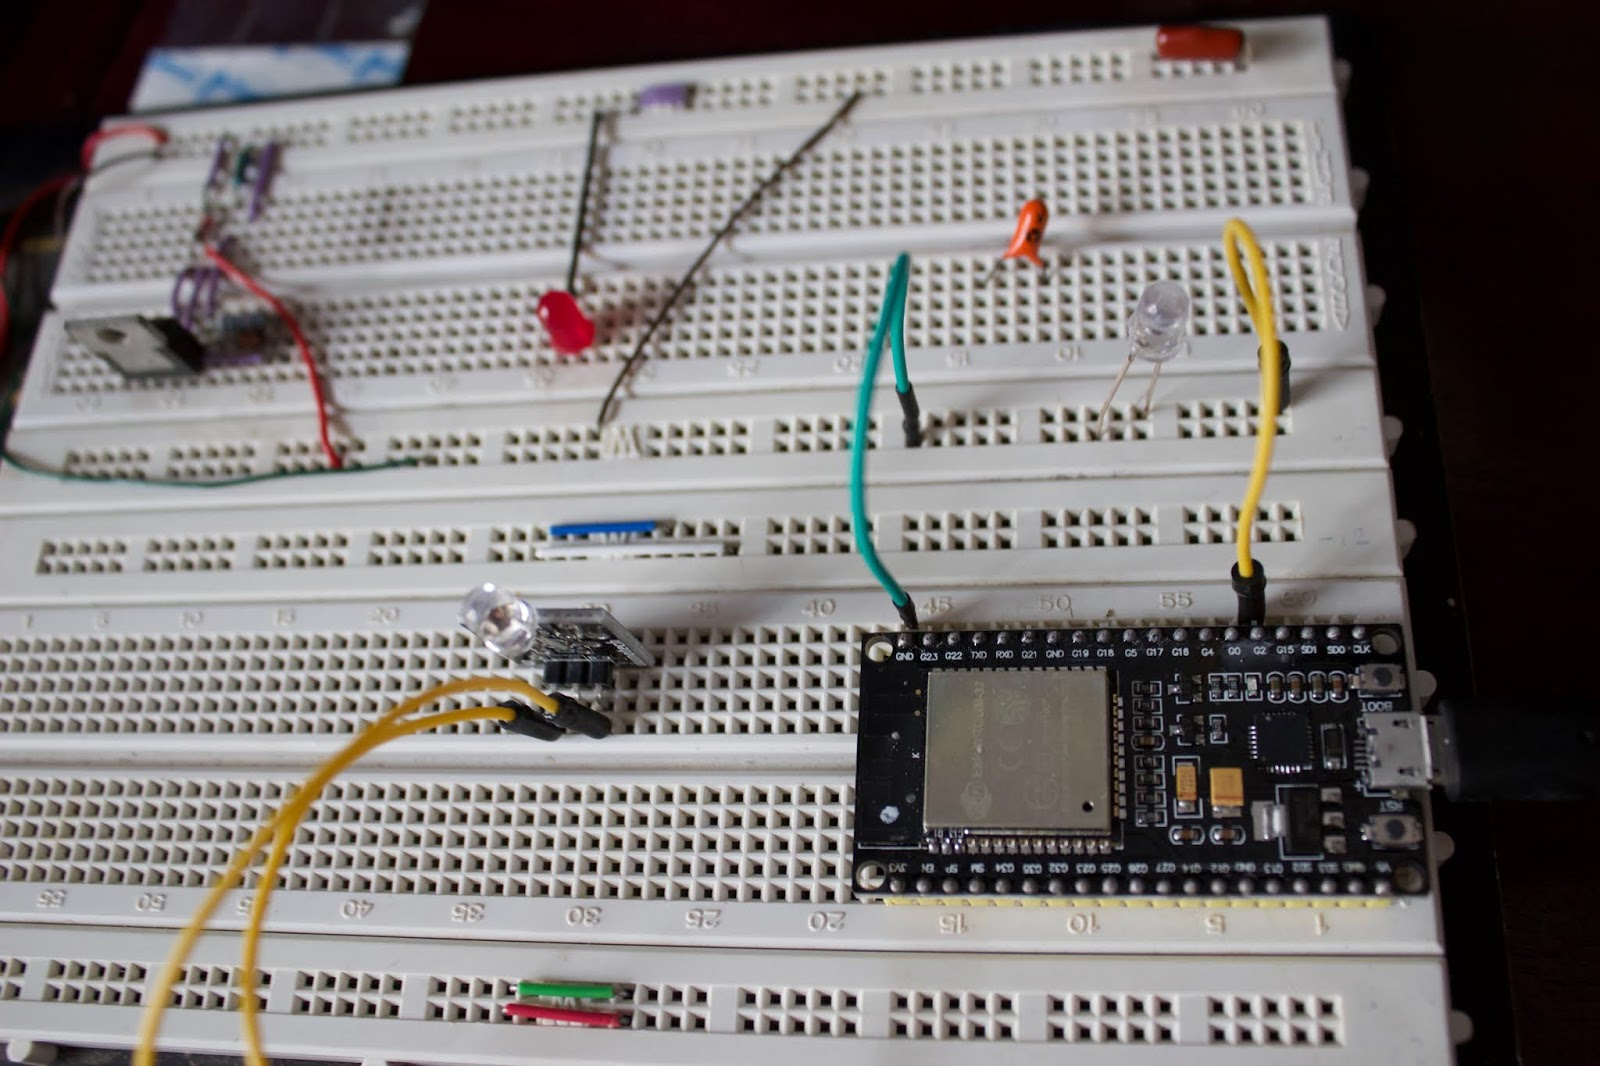 Reefwing Robotics Espressif Esp32 Tutorial Ir Remote Control Infraredtransmittercircuitlabeledonbreadboardjpg Conclusion